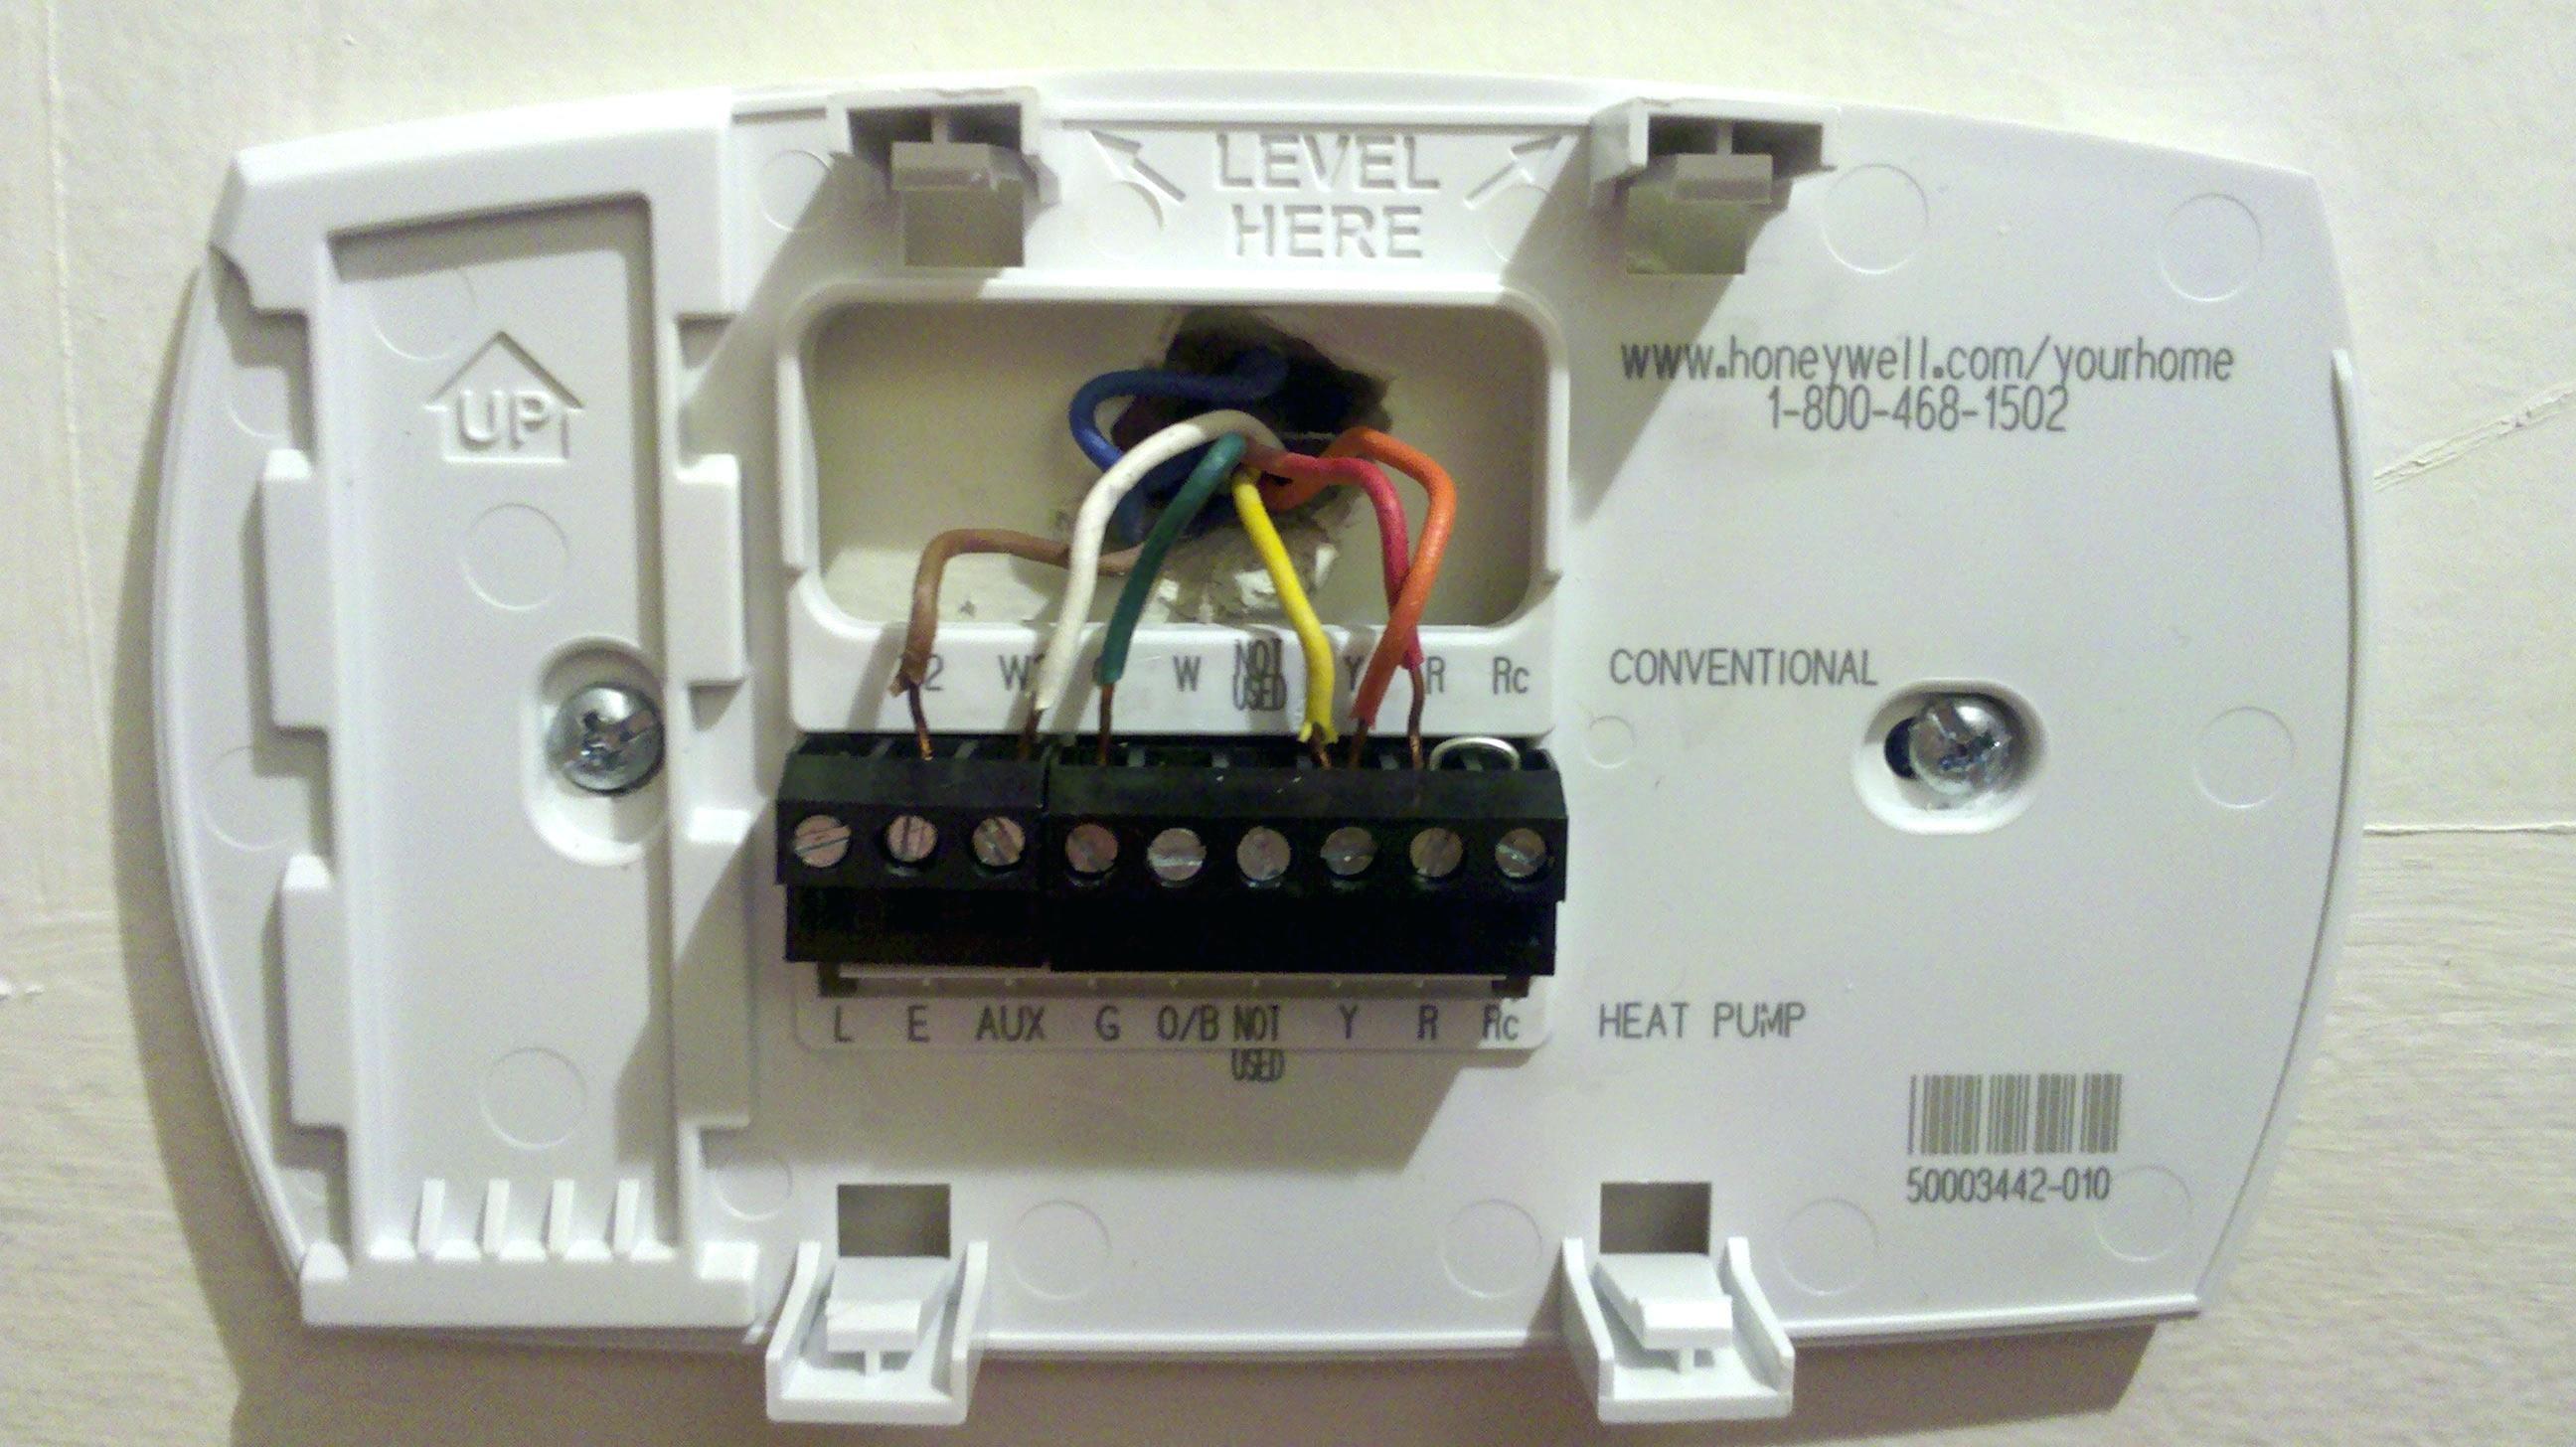 heat pump thermostat wiring diagram honeywell | free ... honeywell rth9580wf thermostat wiring diagram #10